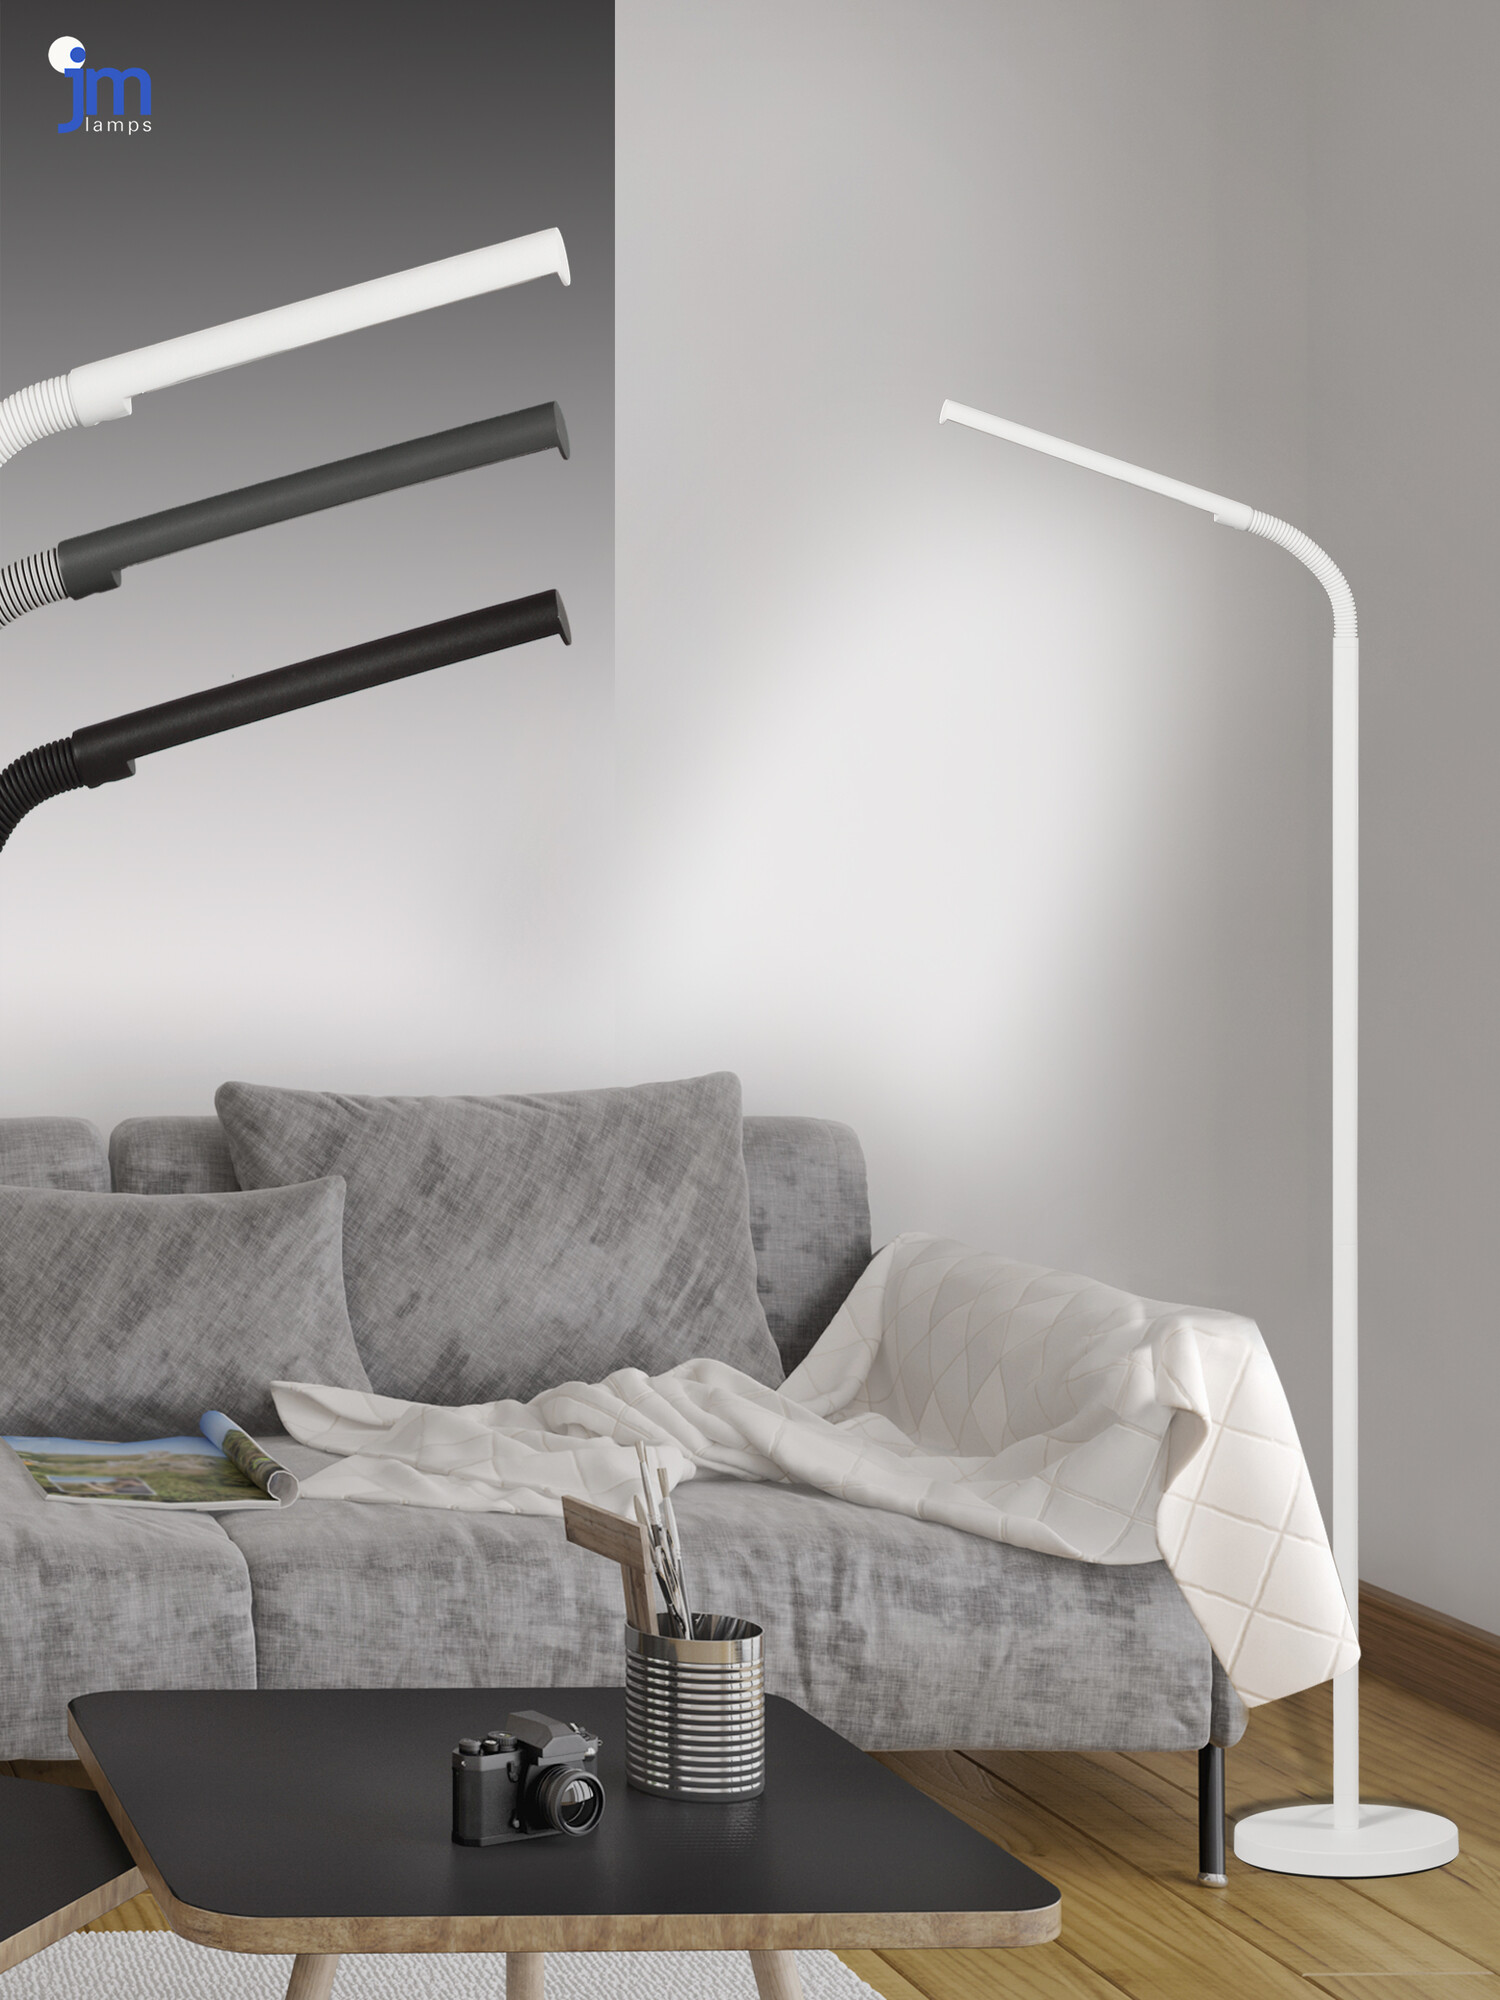 FLEXI vloerlampen